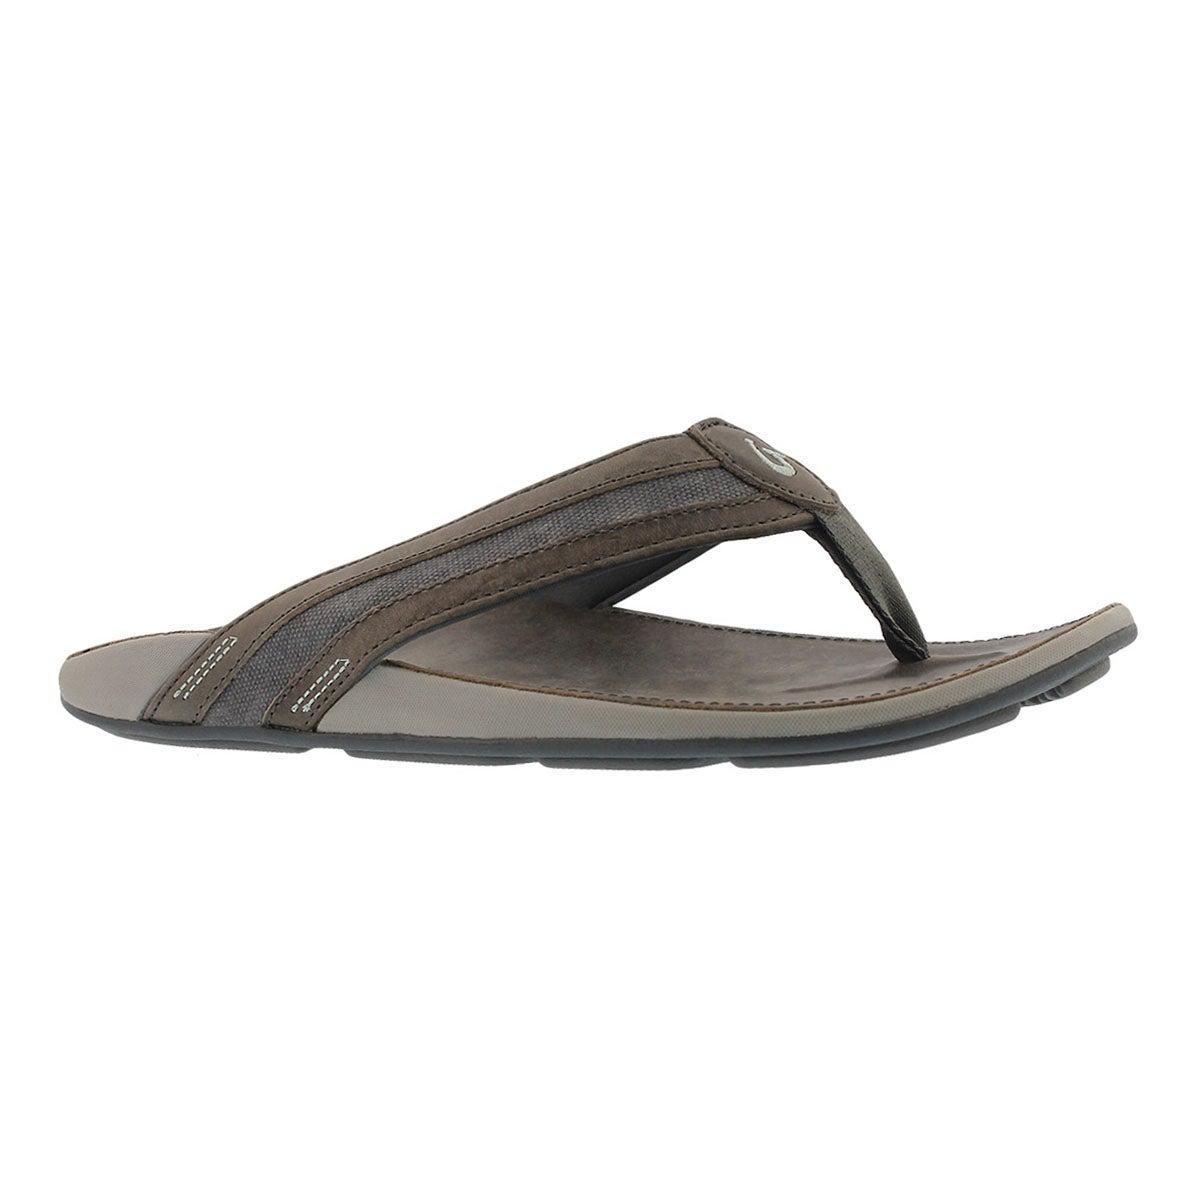 Men's IKOI charcoal thong sandals